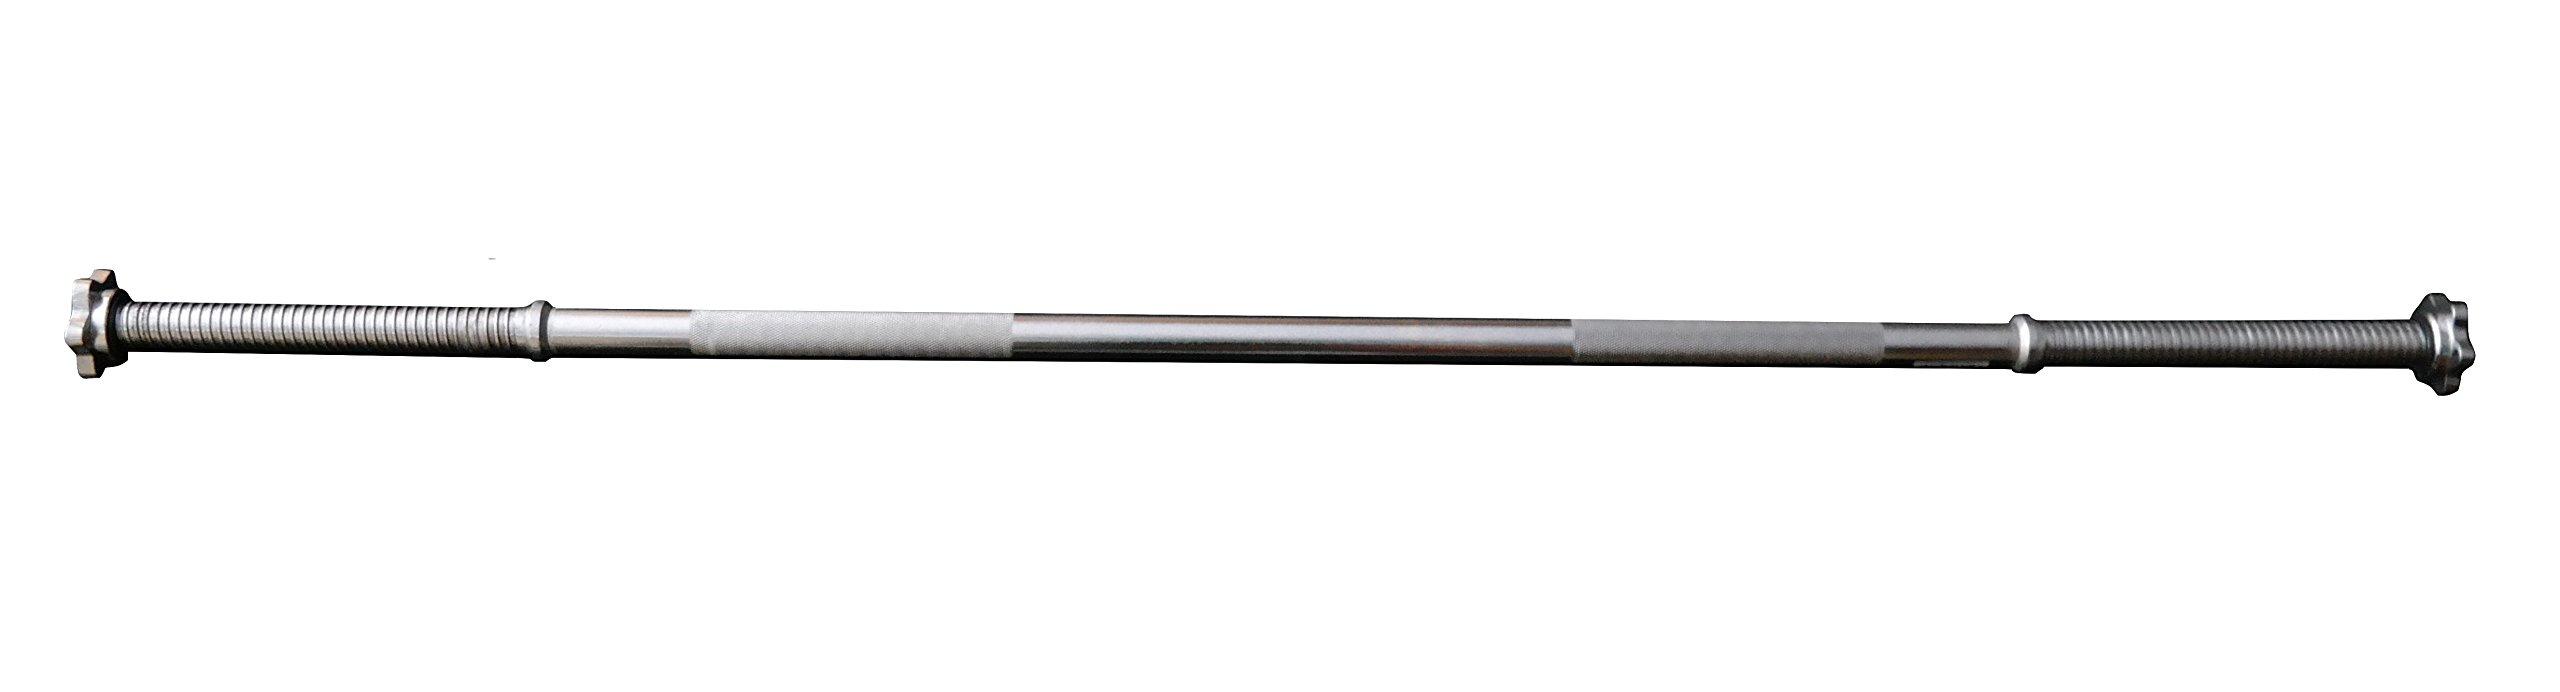 Bollinger 0RB60T Bara Recta, Unisex Adulto, Plateado (cromada), Talla Única product